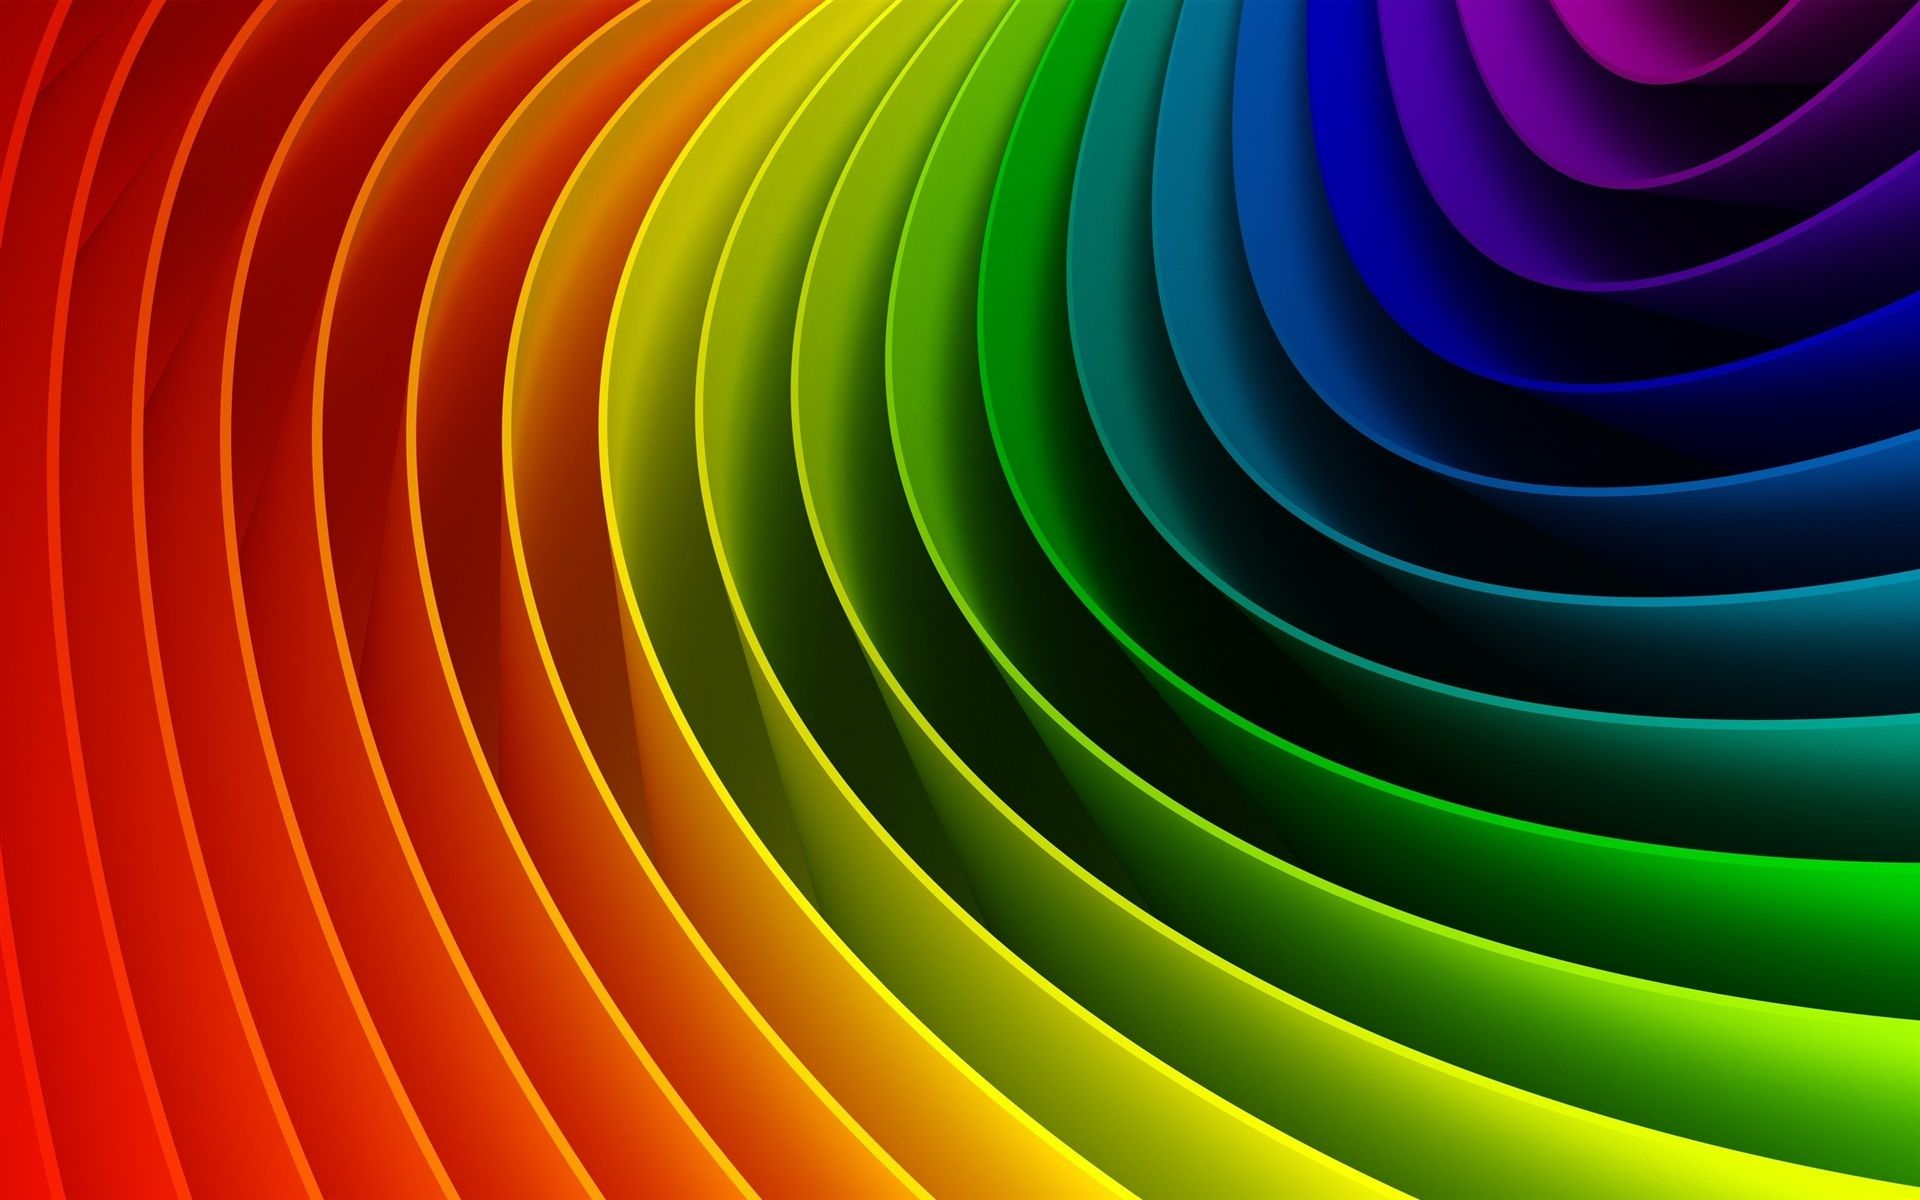 Arco Iris De Colores Curvas